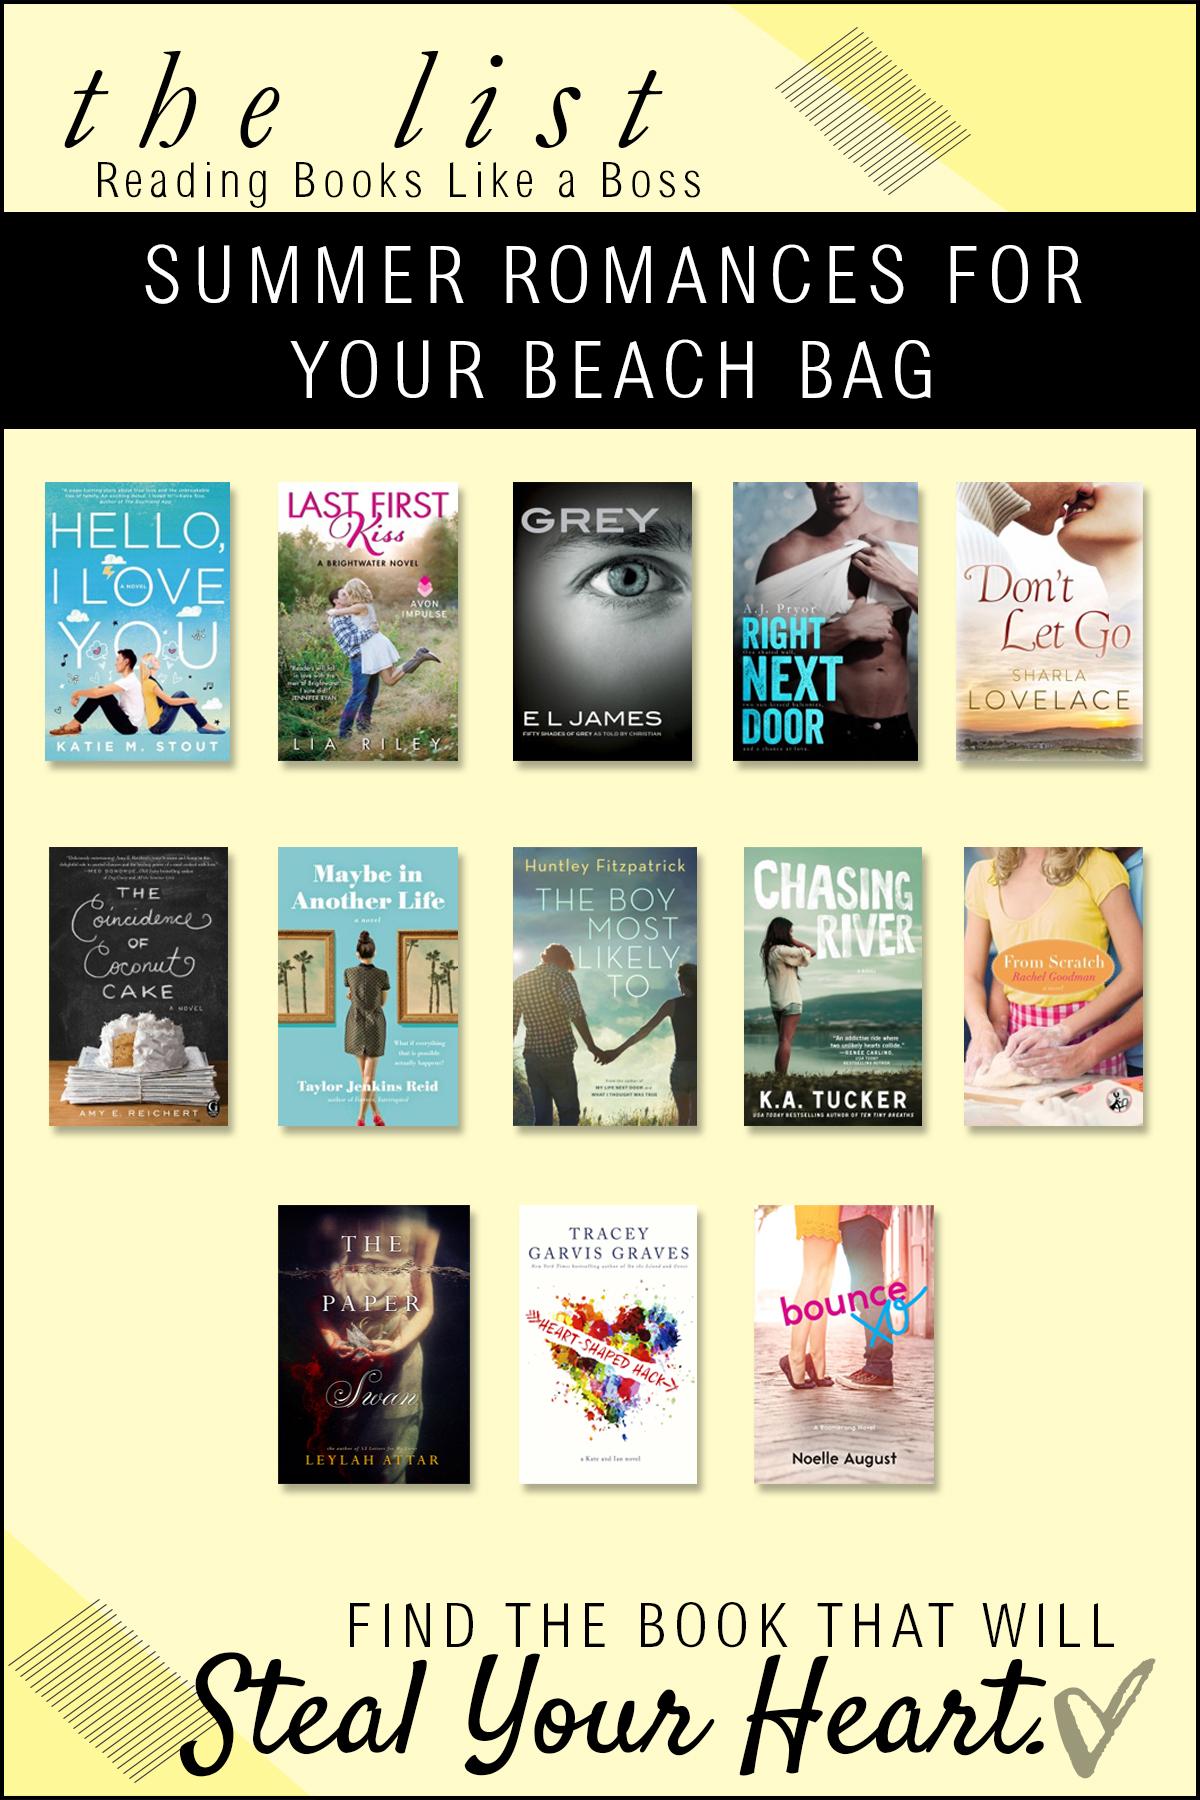 Summer Romance Books for Your Beach Bag via Reading Books Like a Boss